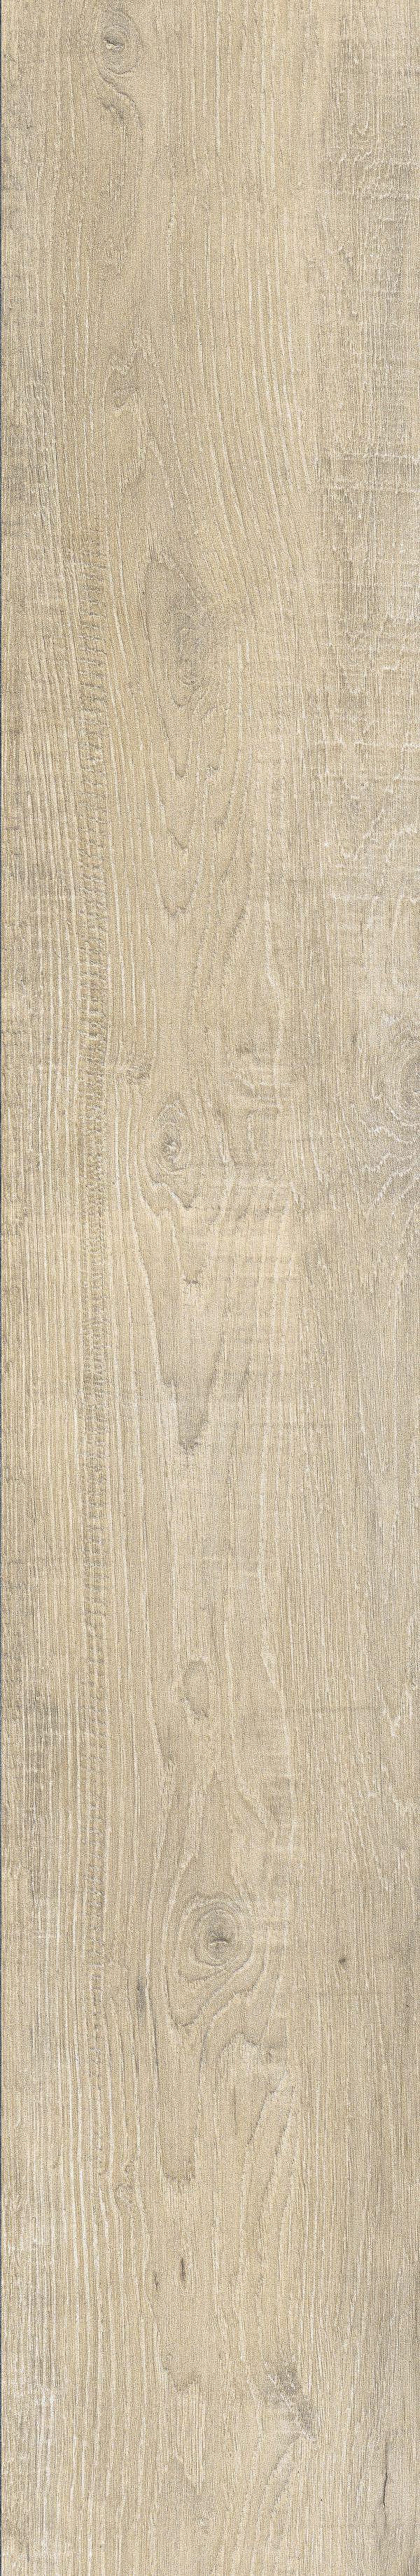 Molise-Beige-119,5x120